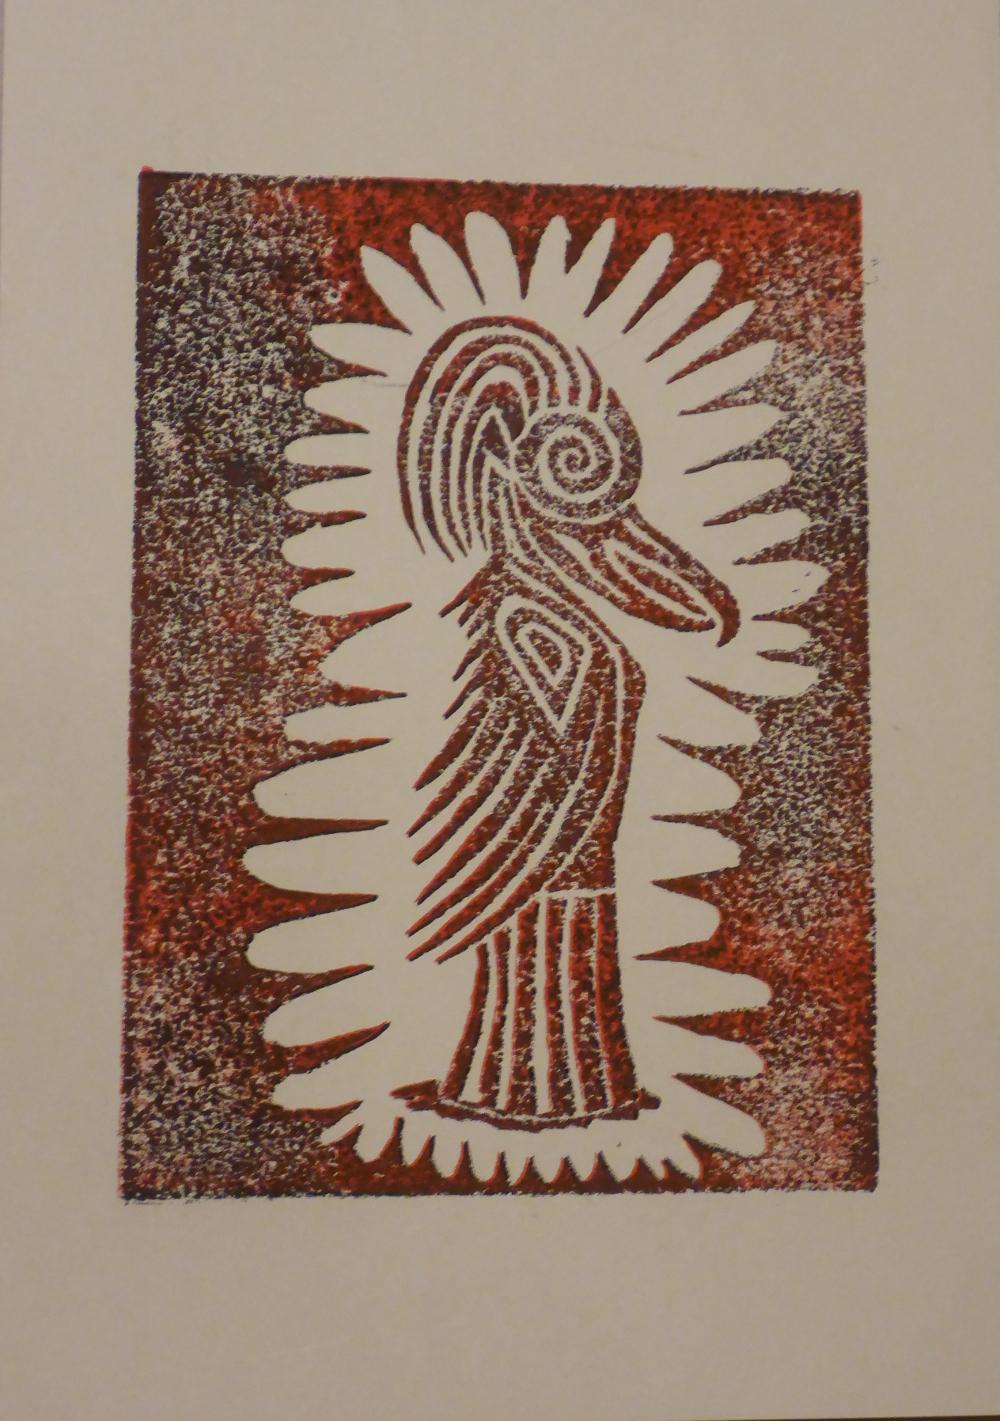 """Eris III"", 2018, linocut on paper, 21 x 30 cm"